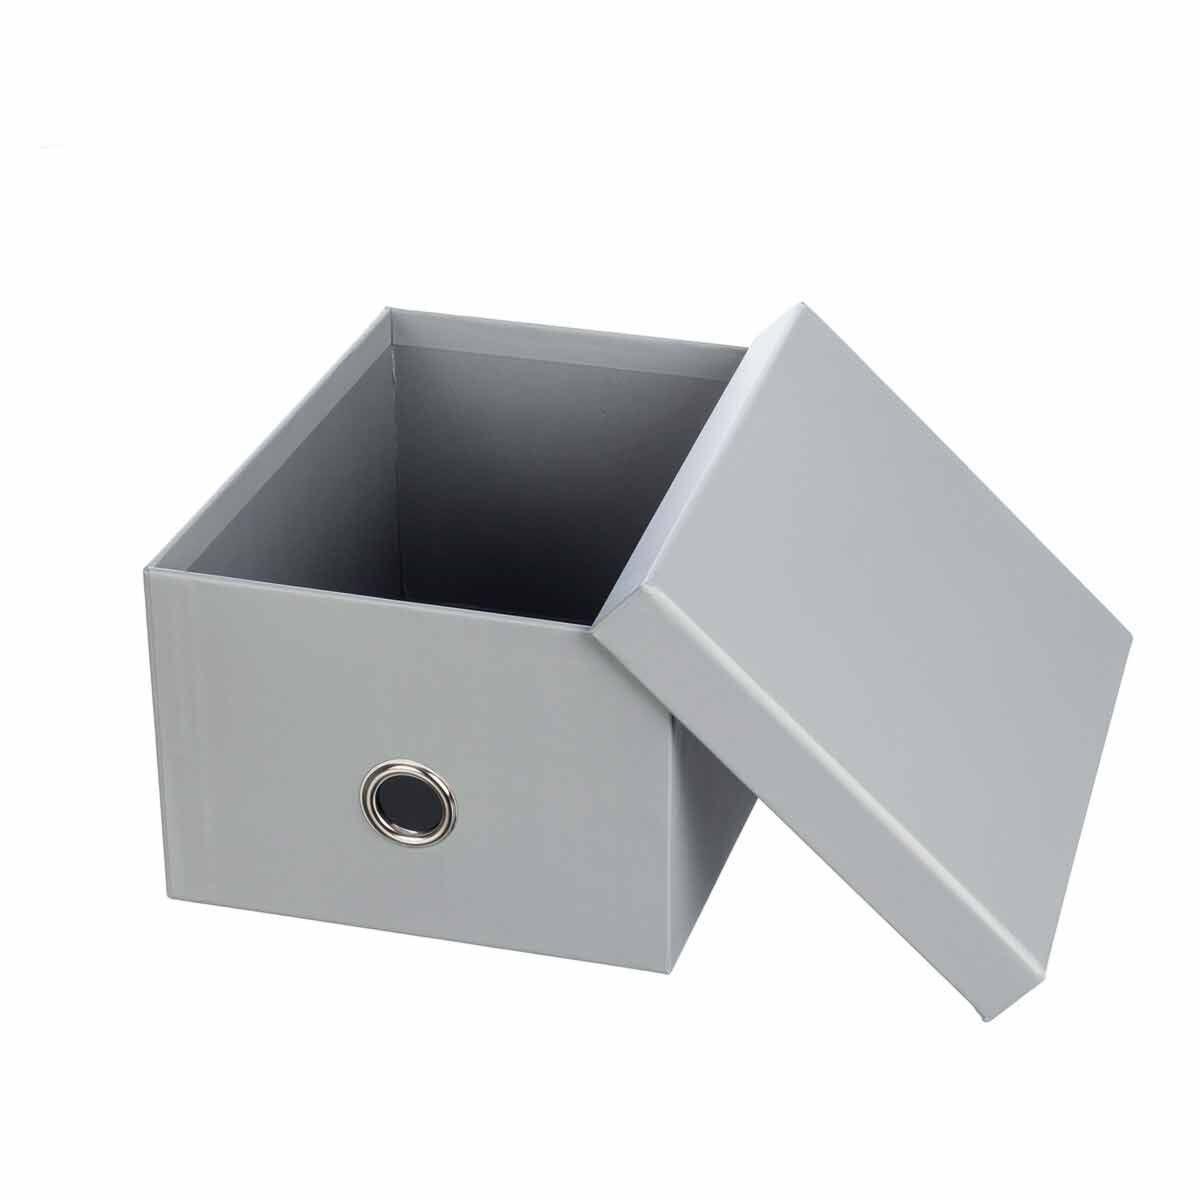 Ryman Storage Box Medium Grey